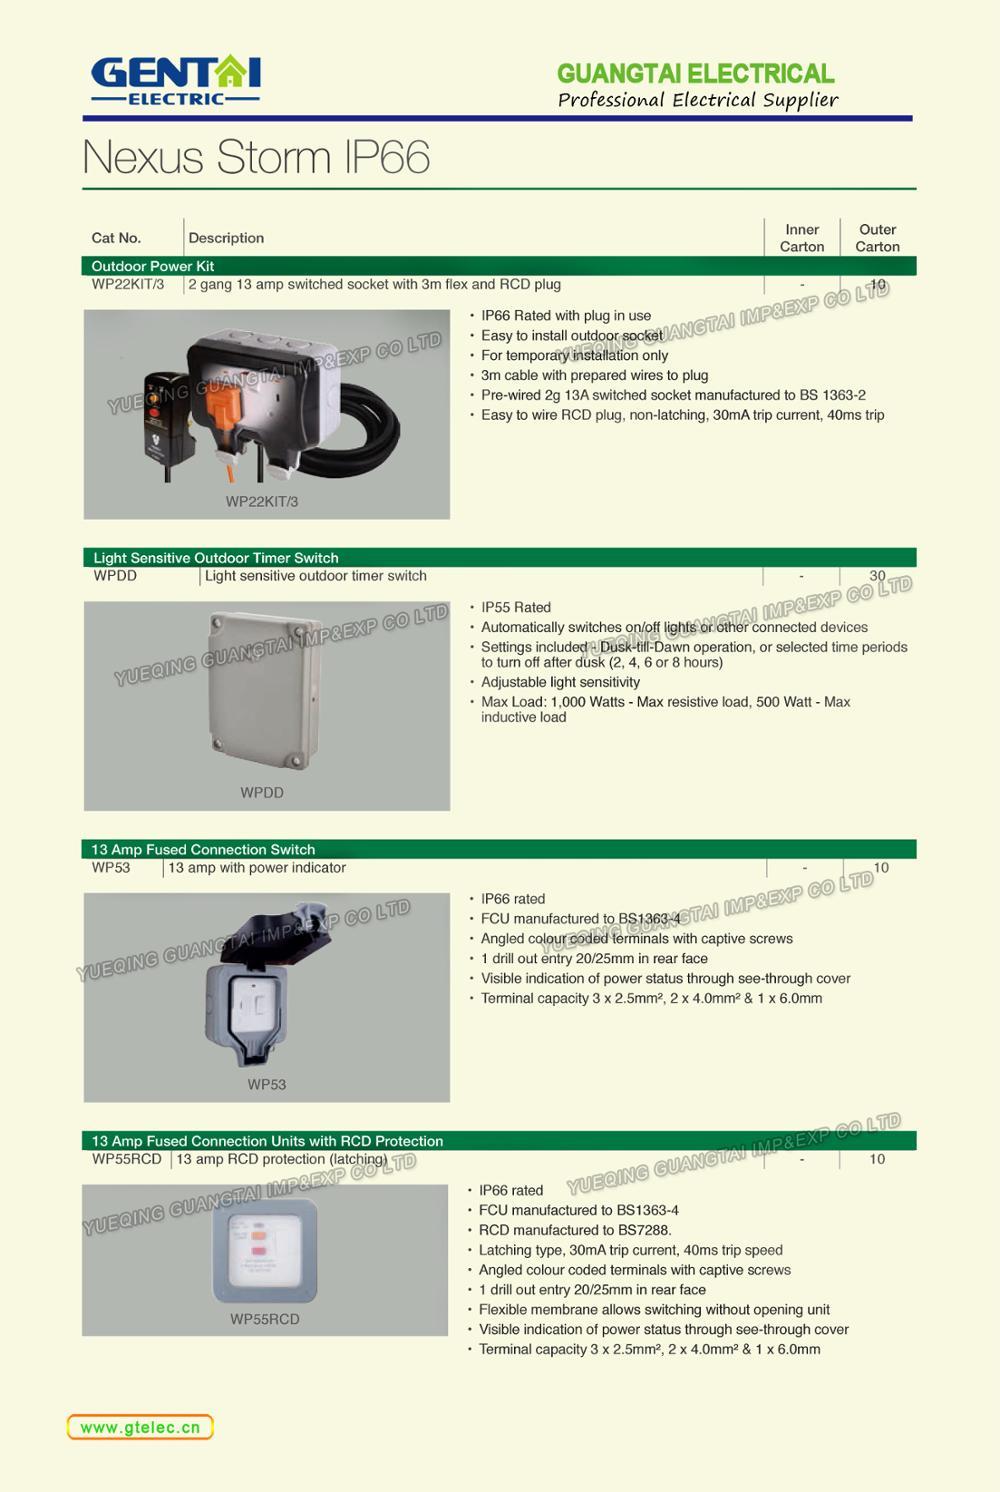 Bg Type Ip66 13a High Quality Weatherproof Junction Box 2gang 1gang Fused